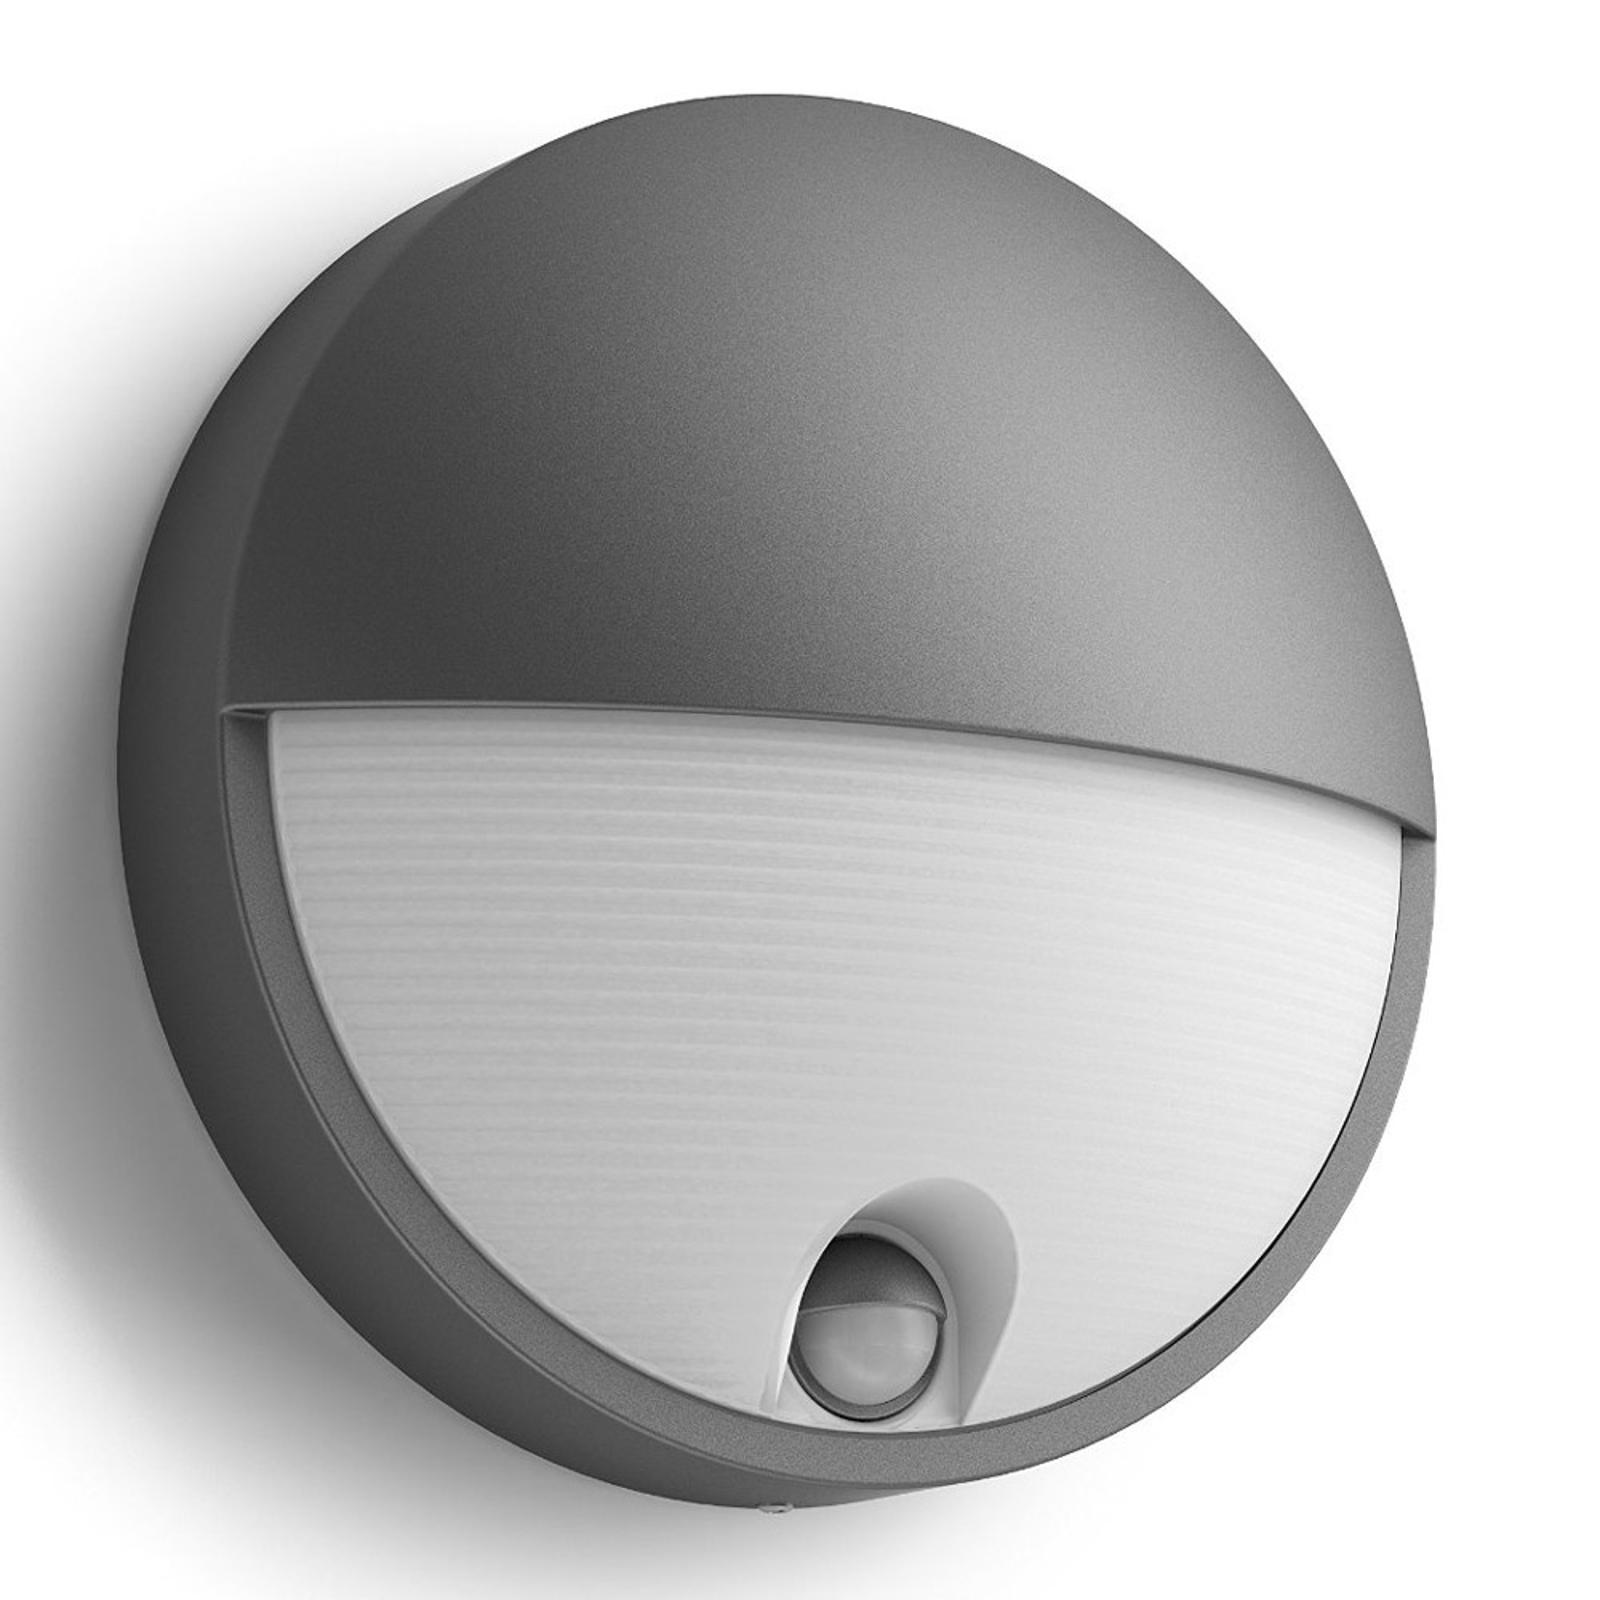 Philips Capricorn LED-Sensor-Außenlampe anthrazit